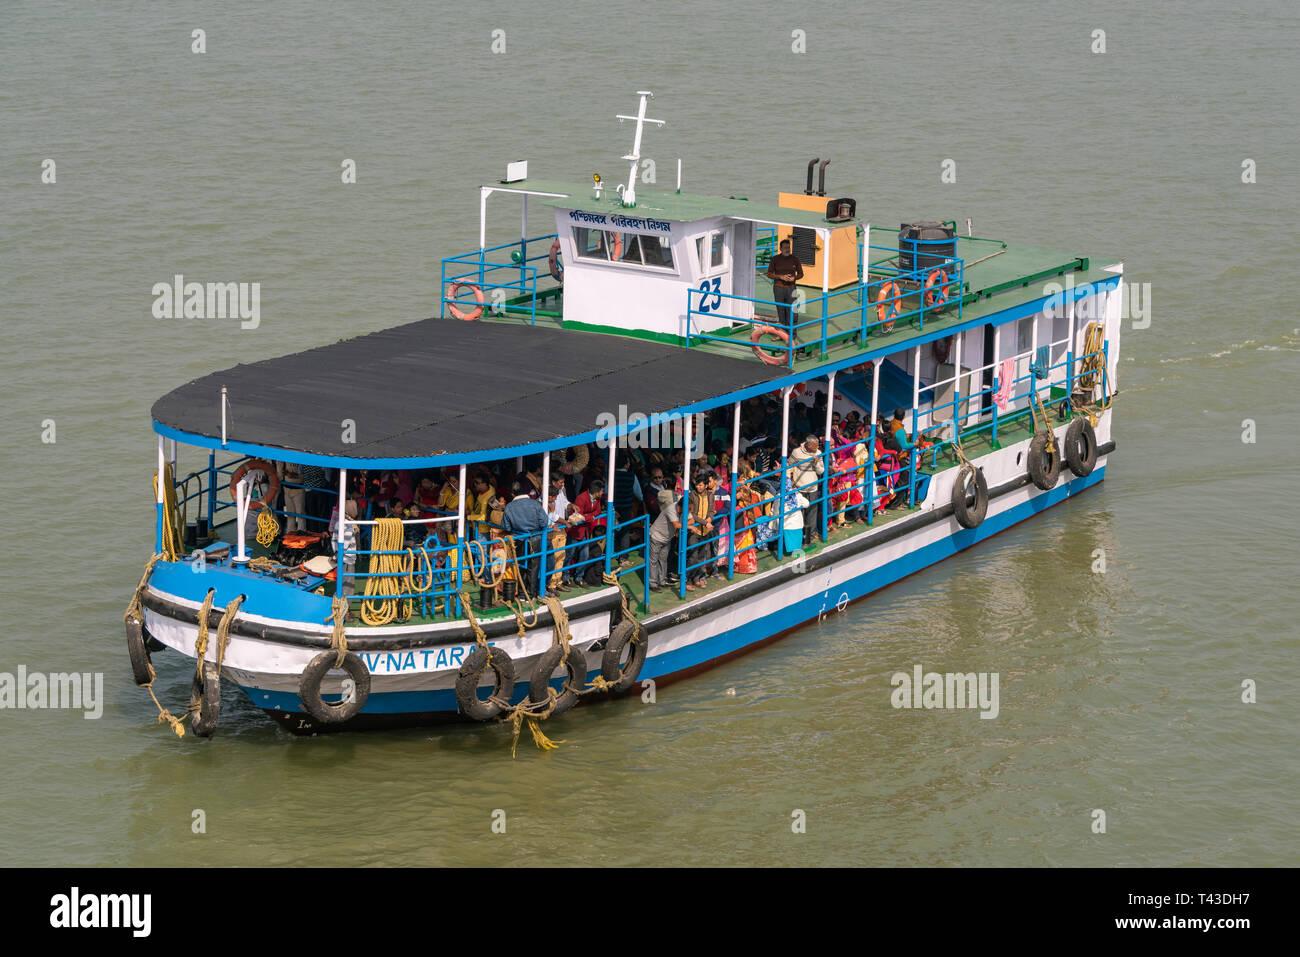 Horizontal aerial view of a ferry in Kolkata aka Calcutta, India. - Stock Image